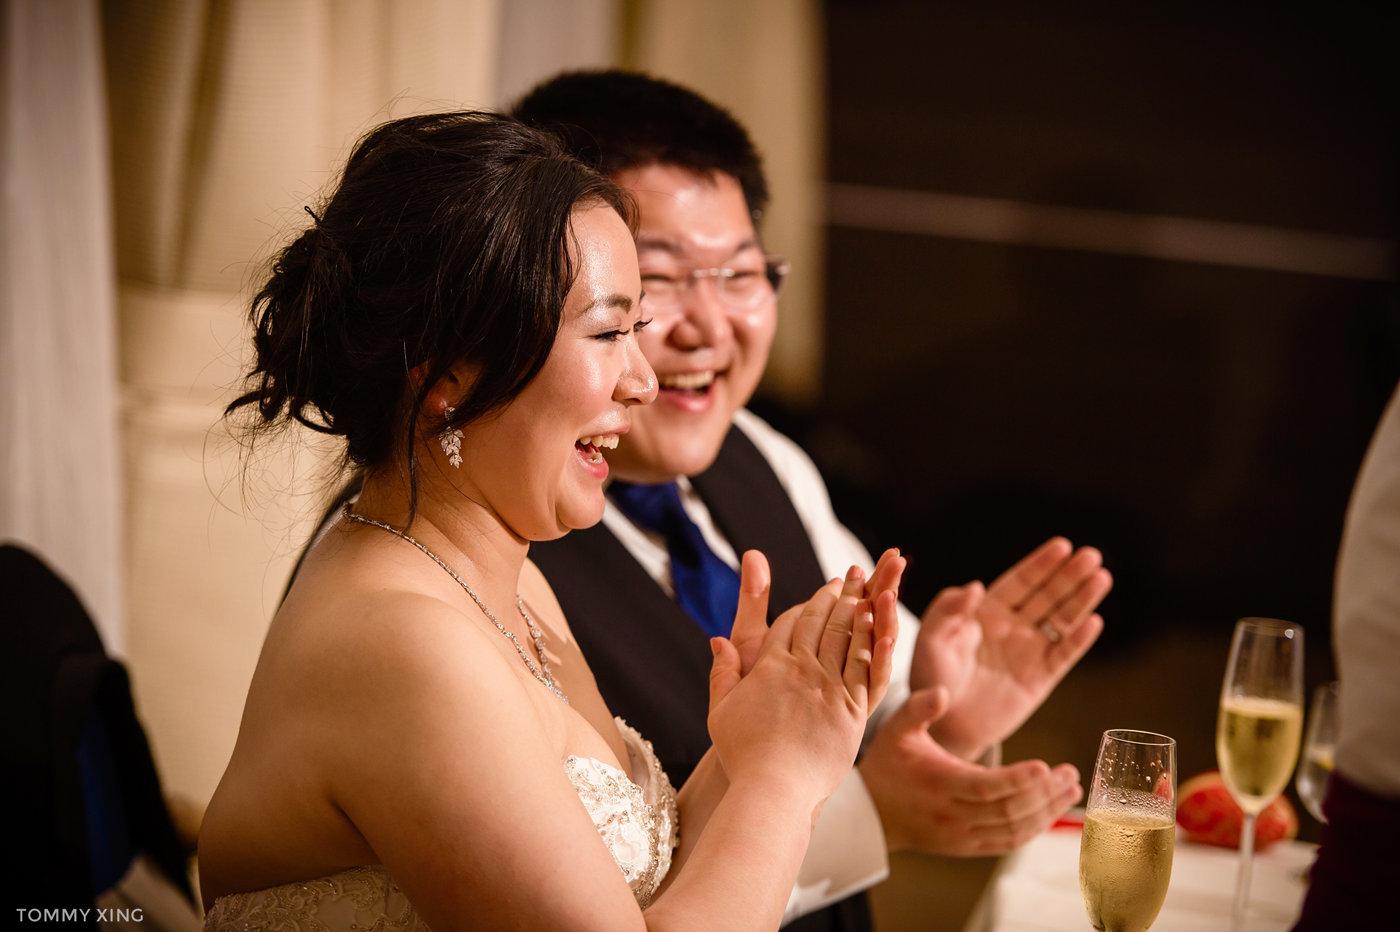 STANFORD MEMORIAL CHURCH WEDDING - Wenjie & Chengcheng - SAN FRANCISCO BAY AREA 斯坦福教堂婚礼跟拍 - 洛杉矶婚礼婚纱照摄影师 Tommy Xing Photography230.jpg